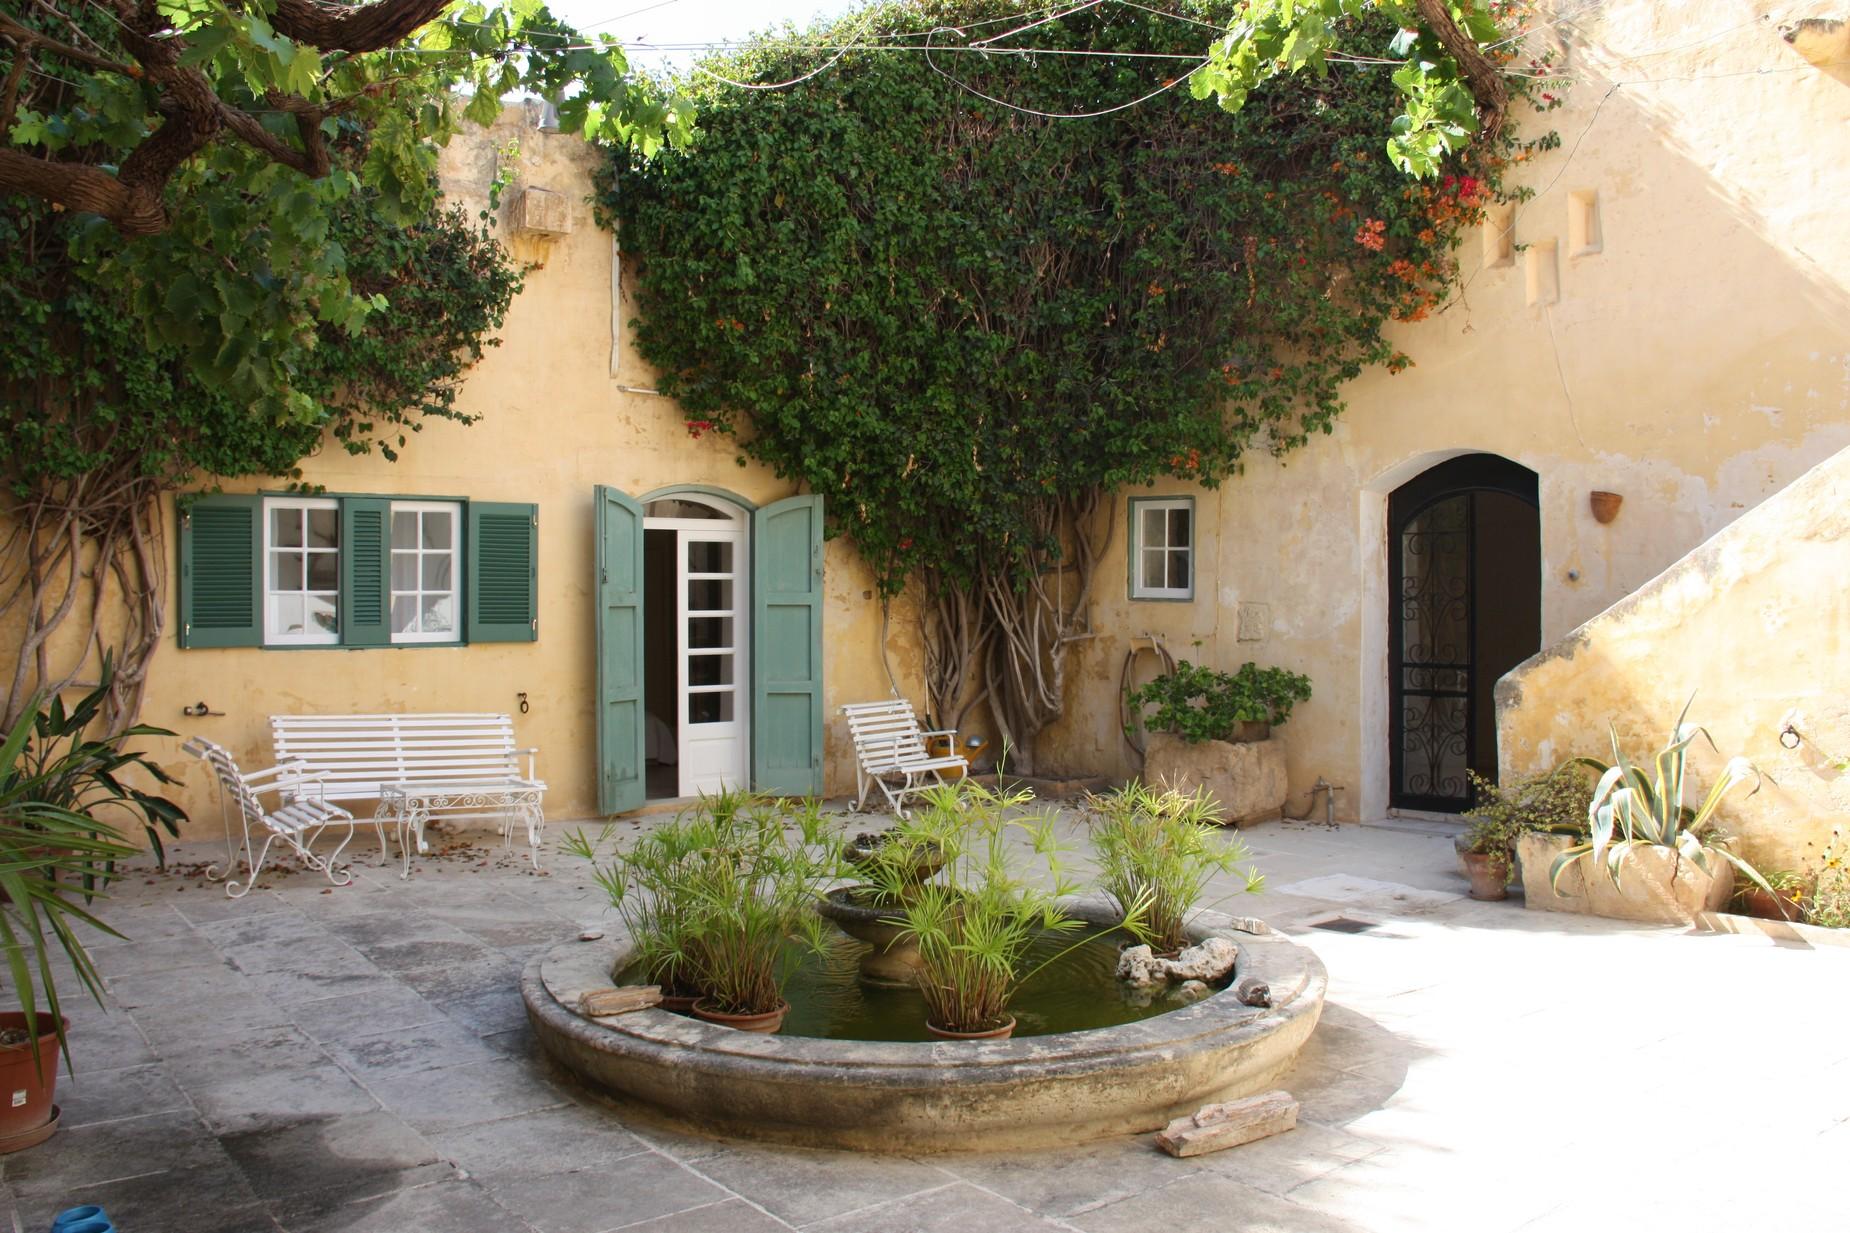 4 bed House of Character For Rent in Balzan, Balzan - thumb 2